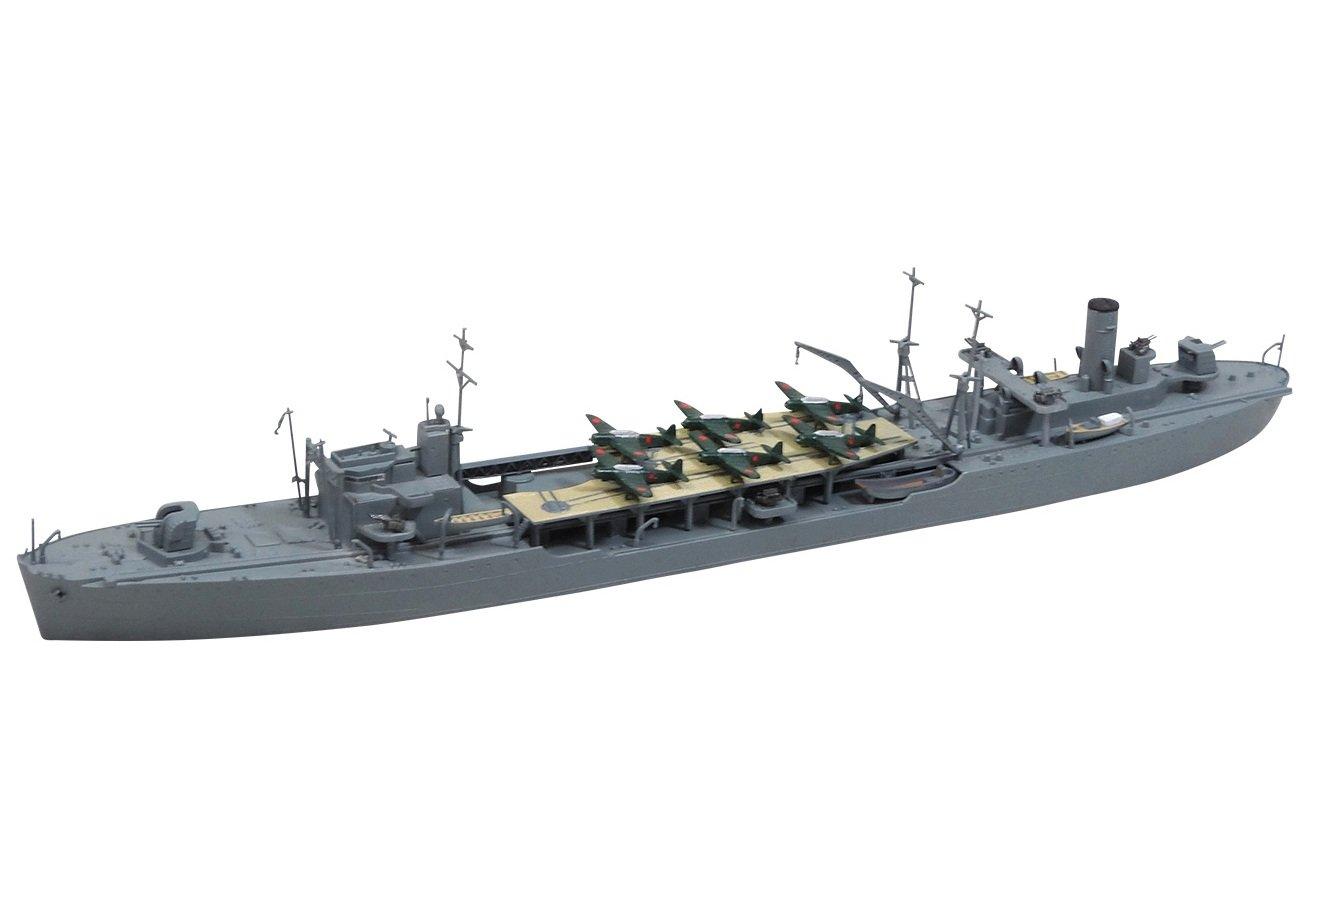 1/700 Wasserlinie Super Detail Betankung Schiff Haya ? SD Kunststoff Aoshima Bunka kyozai -